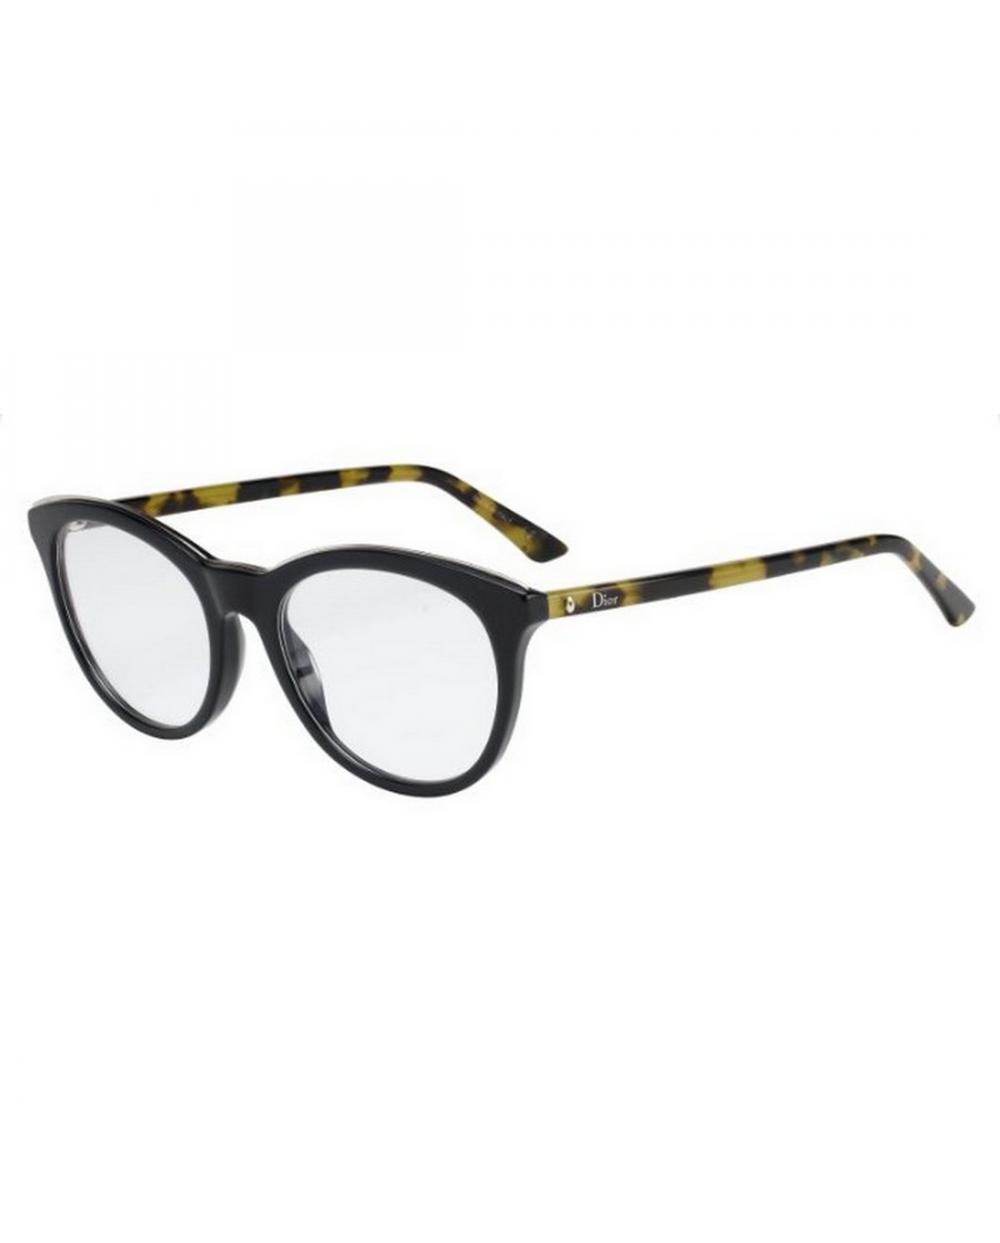 Eyewear, eyeglasses Christian Dior Montaigne41 packaging origianale warranty italy